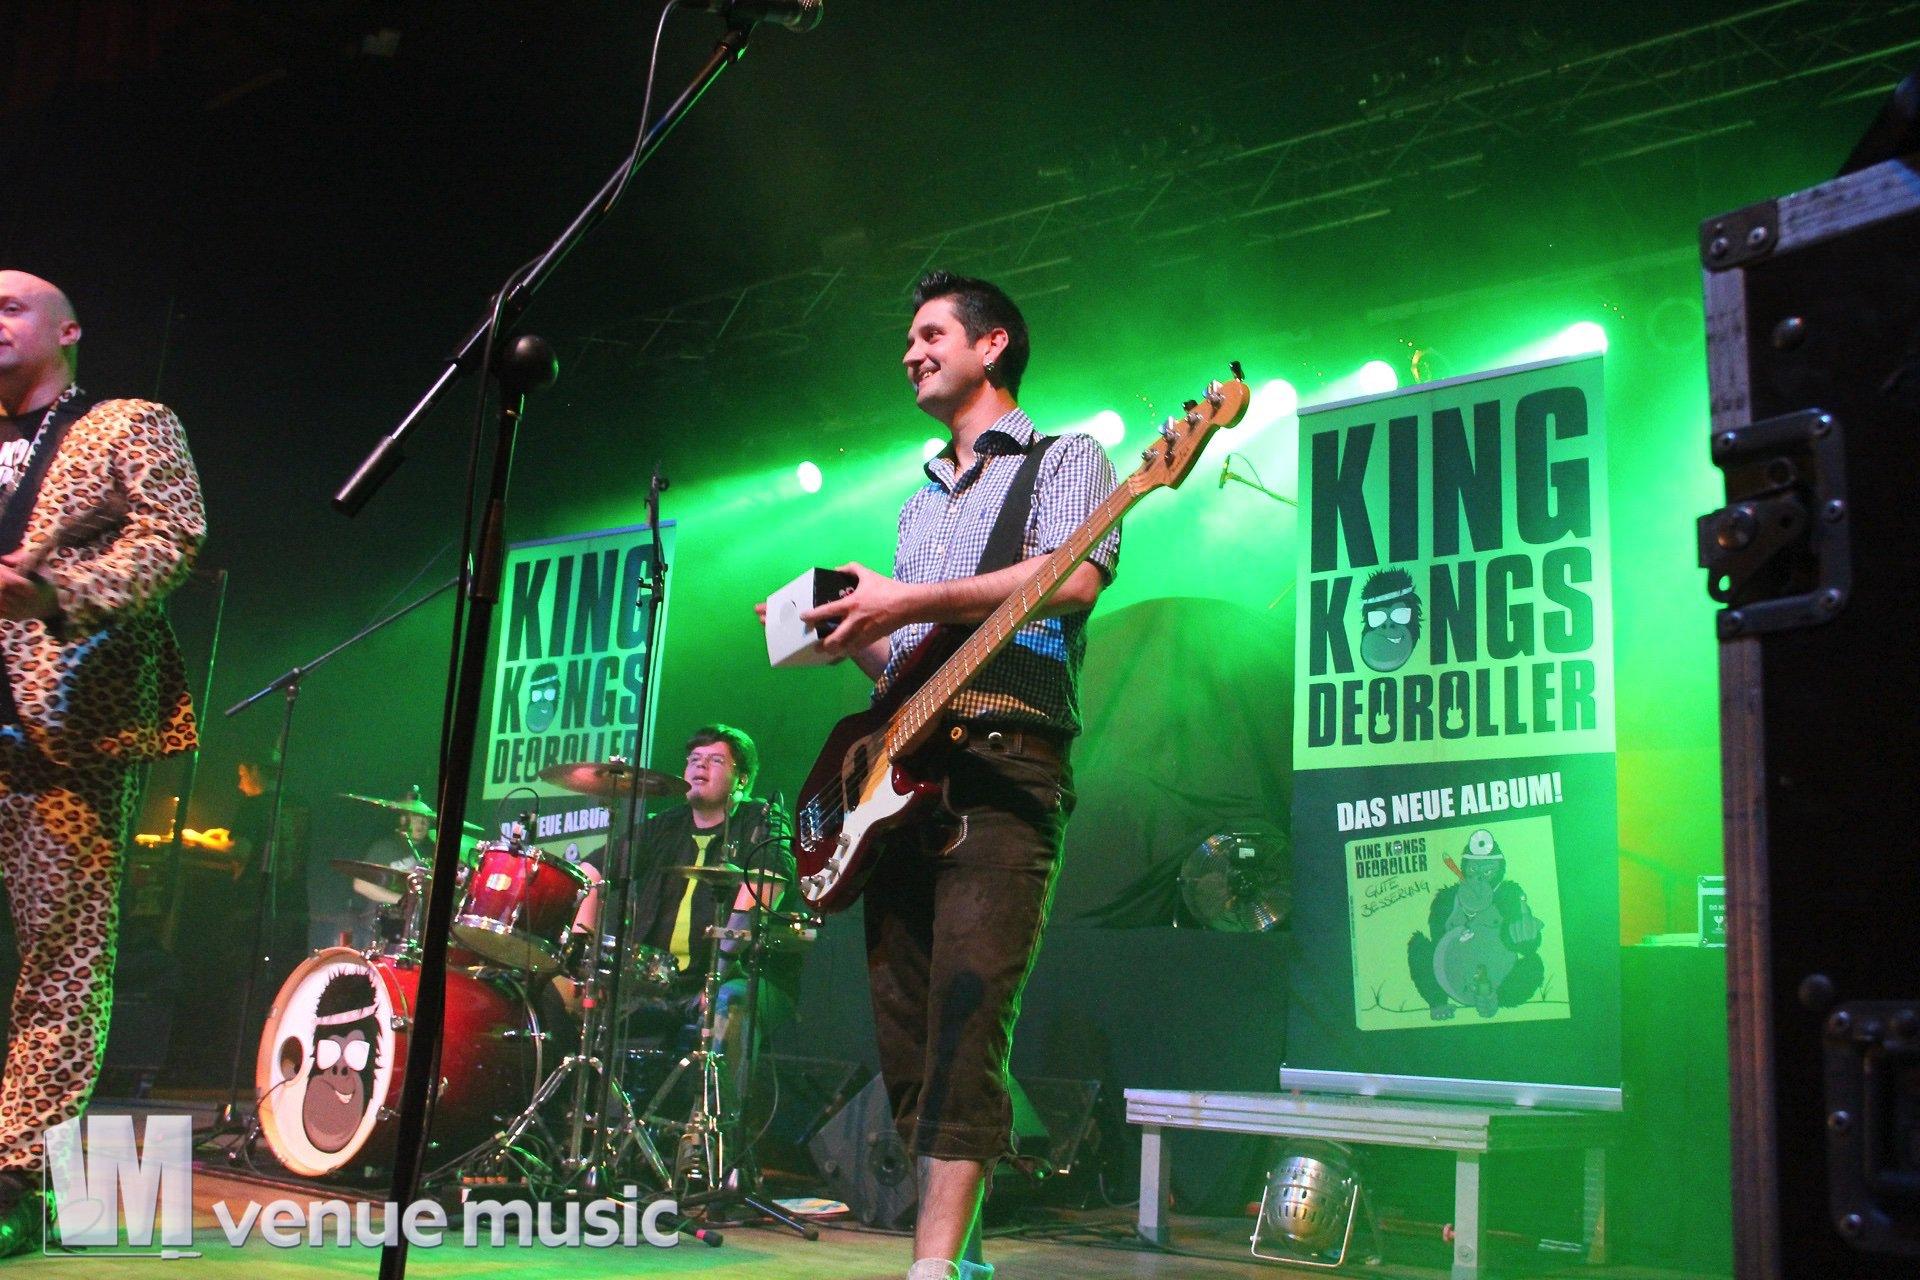 King Kongs Deoroller @ Tivoli, Freiberg